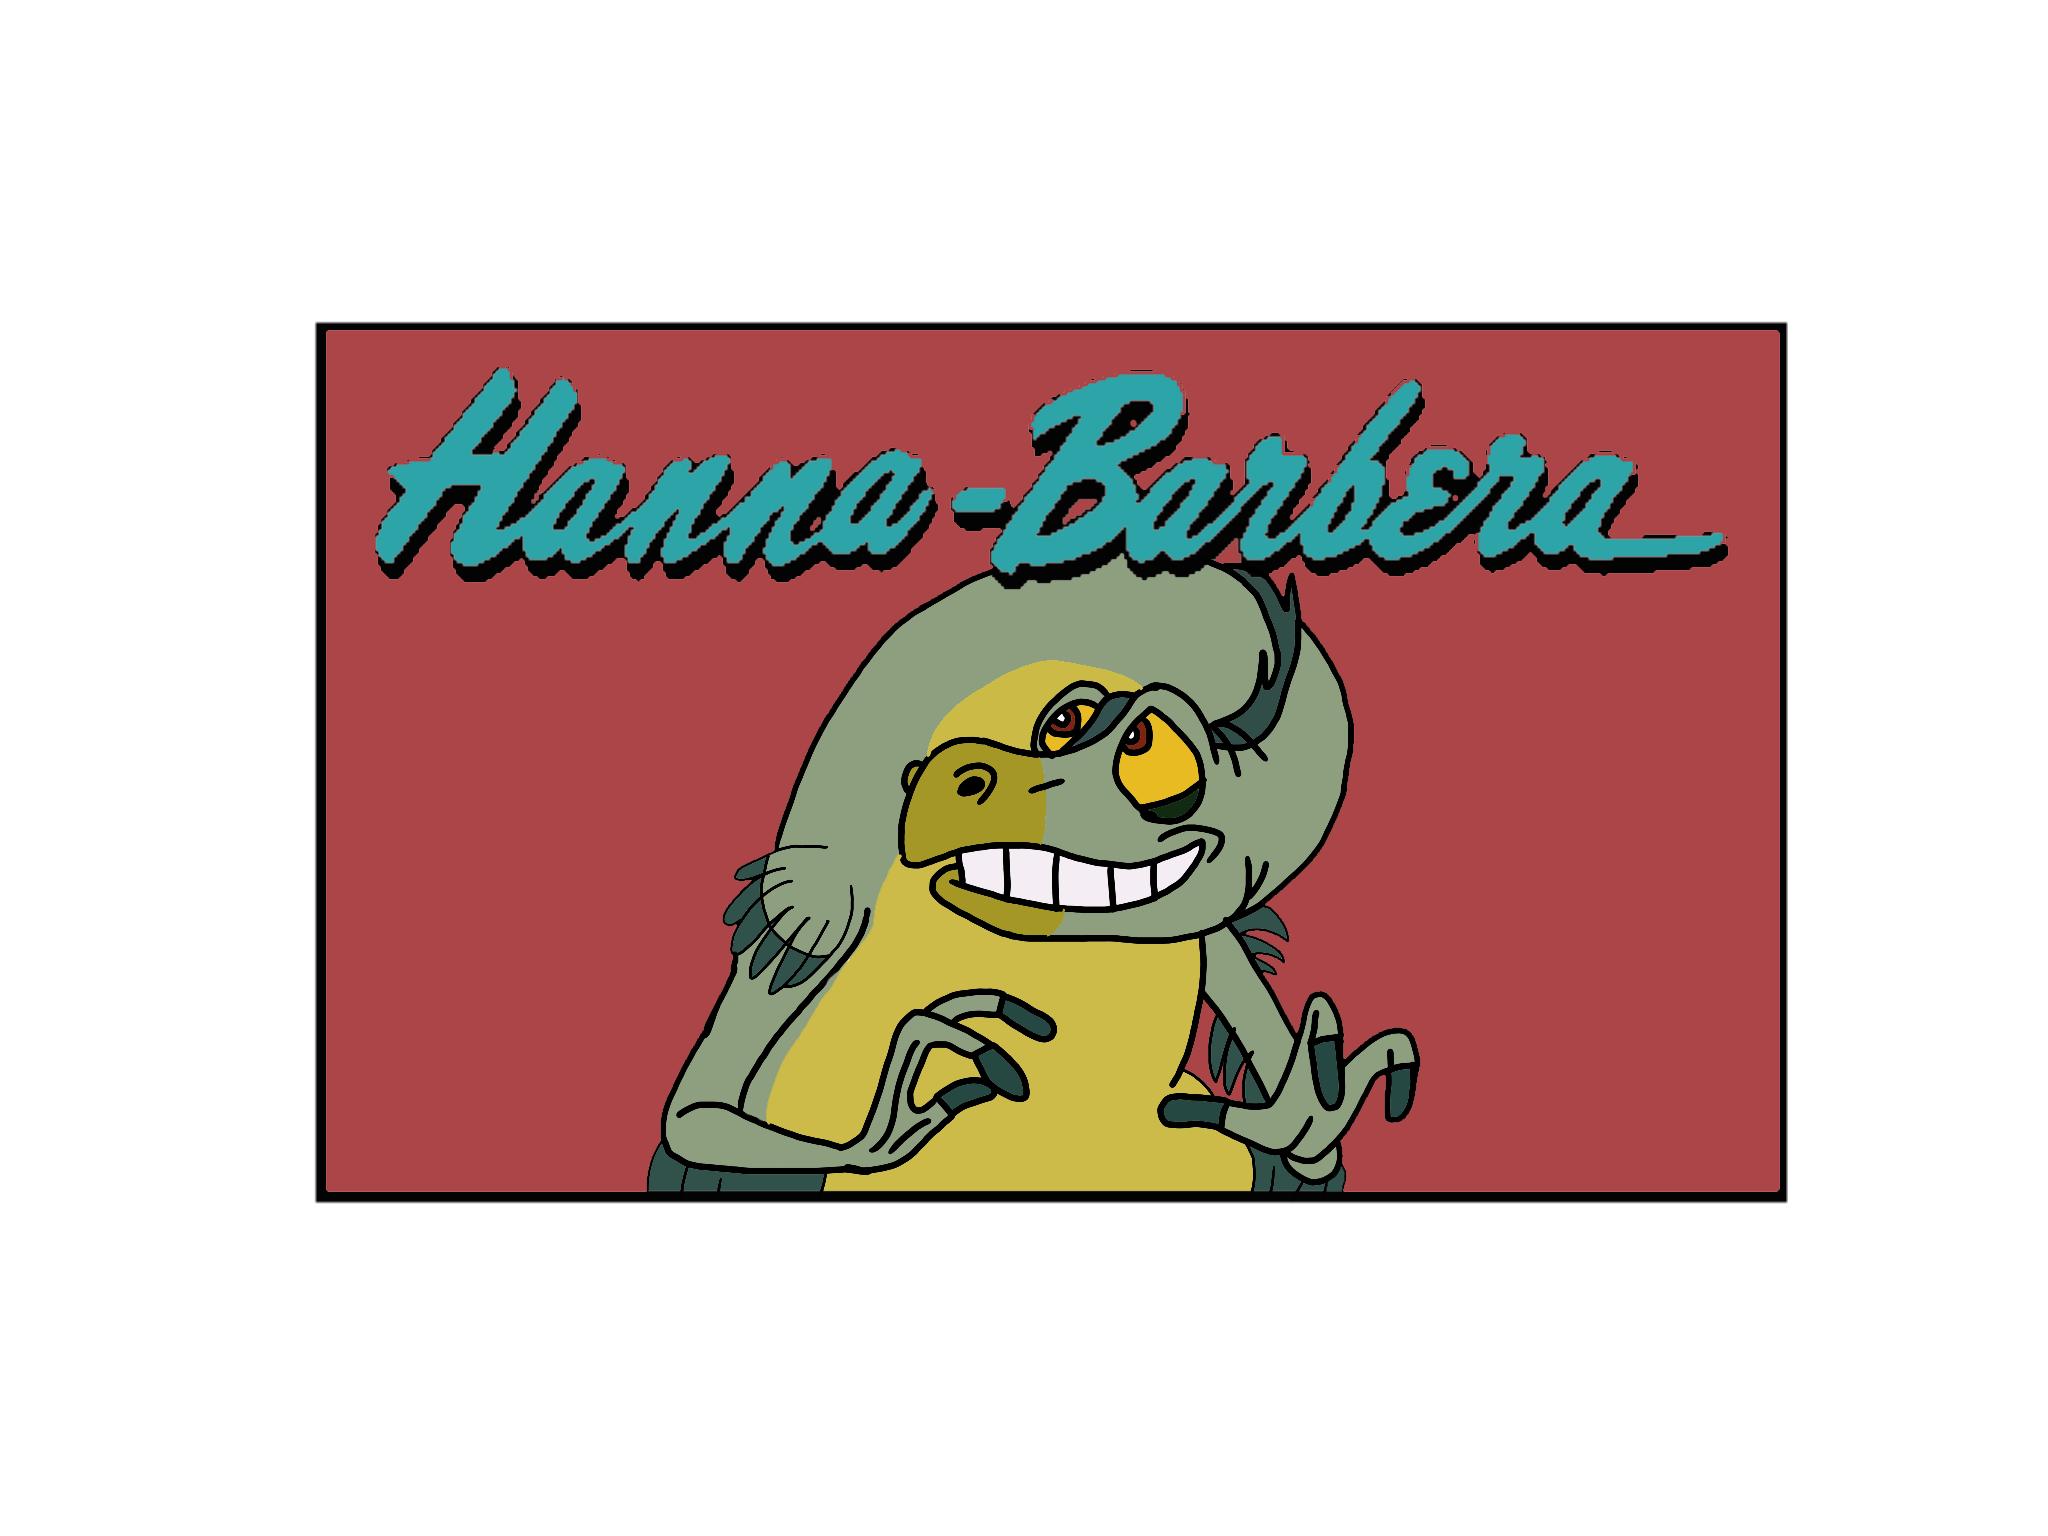 Hanna-Barbera logo (Wild Arms' Excellent Adventure)